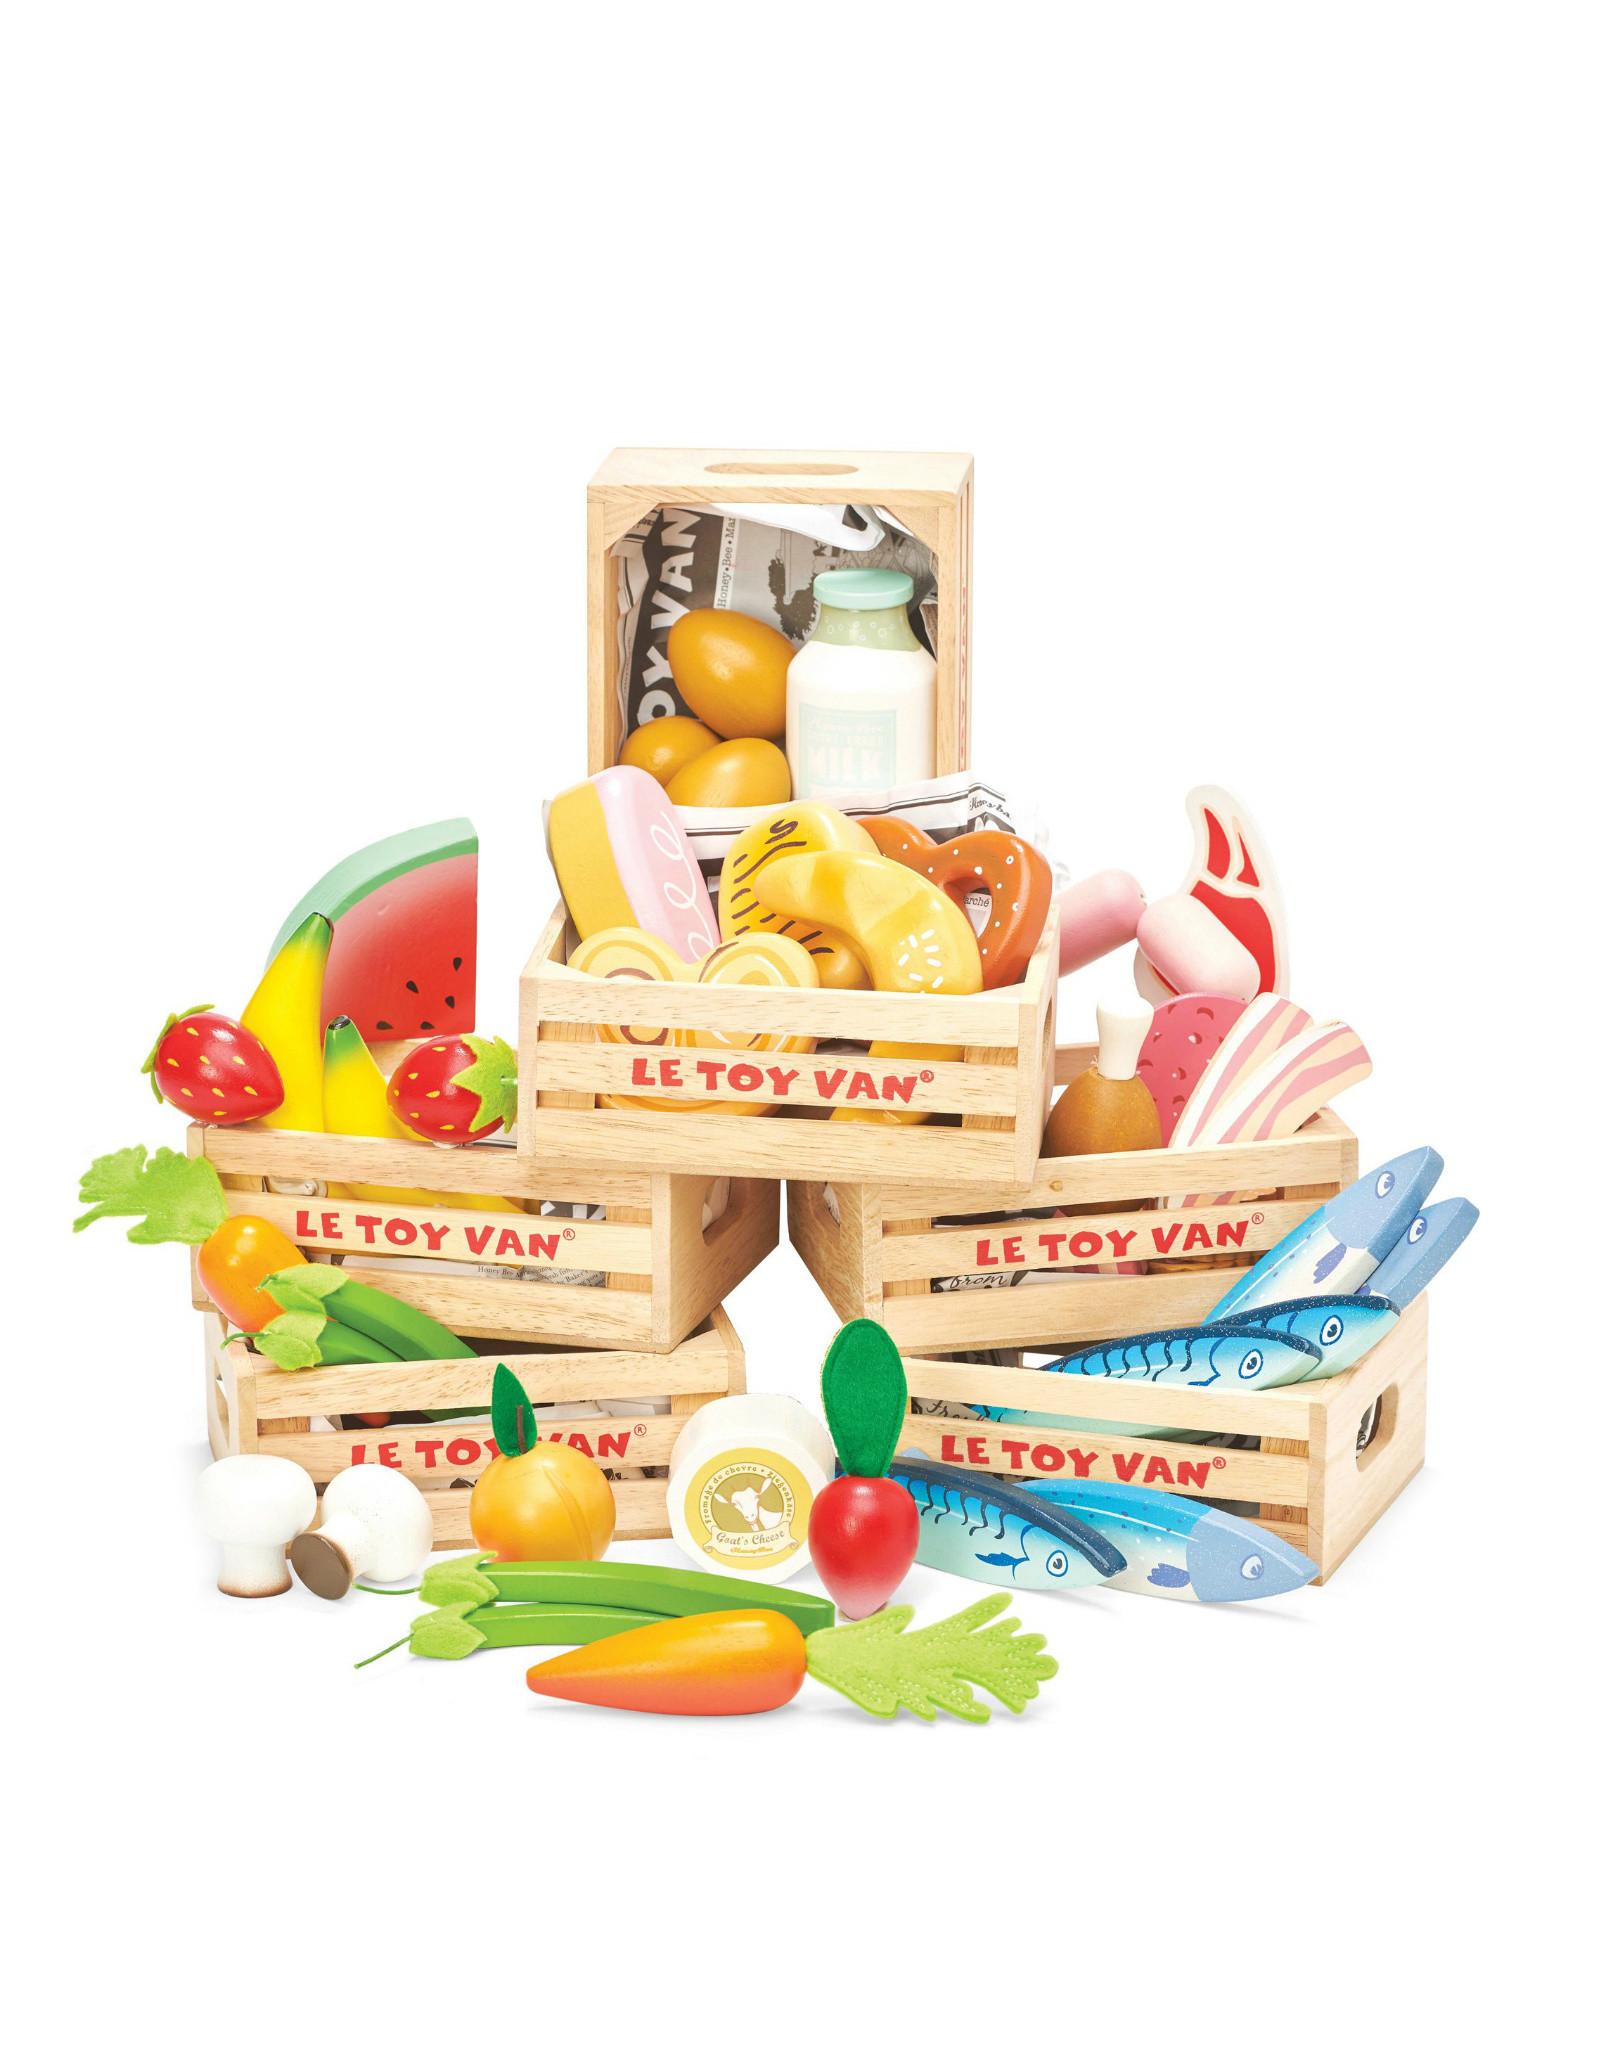 Le Toy Van Market Meat Crate